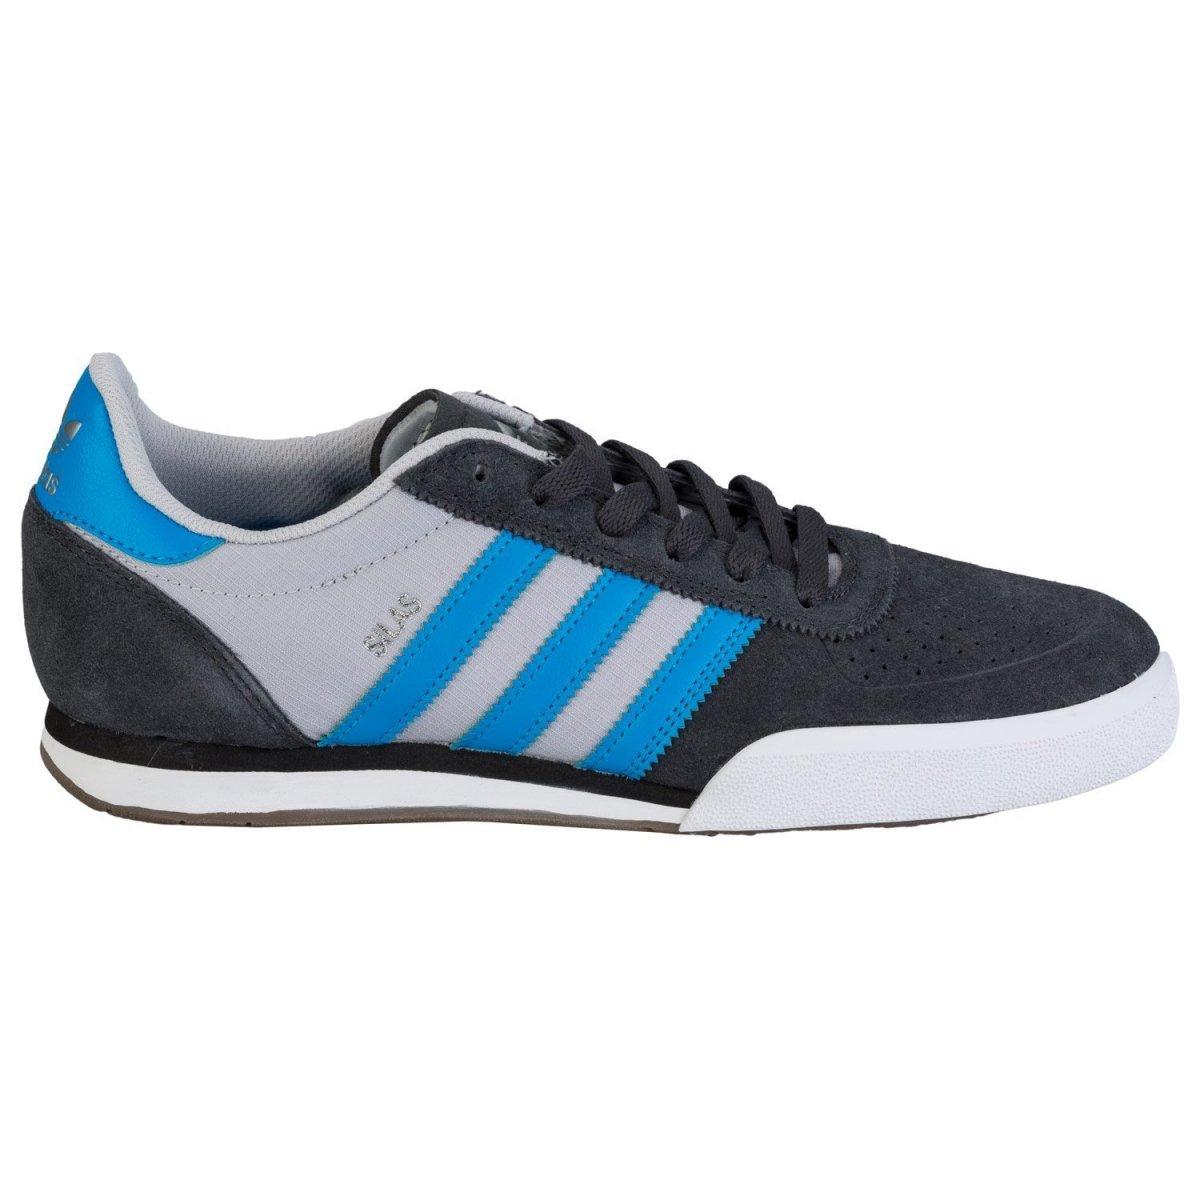 Details about ADIDAS ORIGINALS SILAS SLR Men shoes Sneakers Athletic  Trainers C75704 b0e88a277